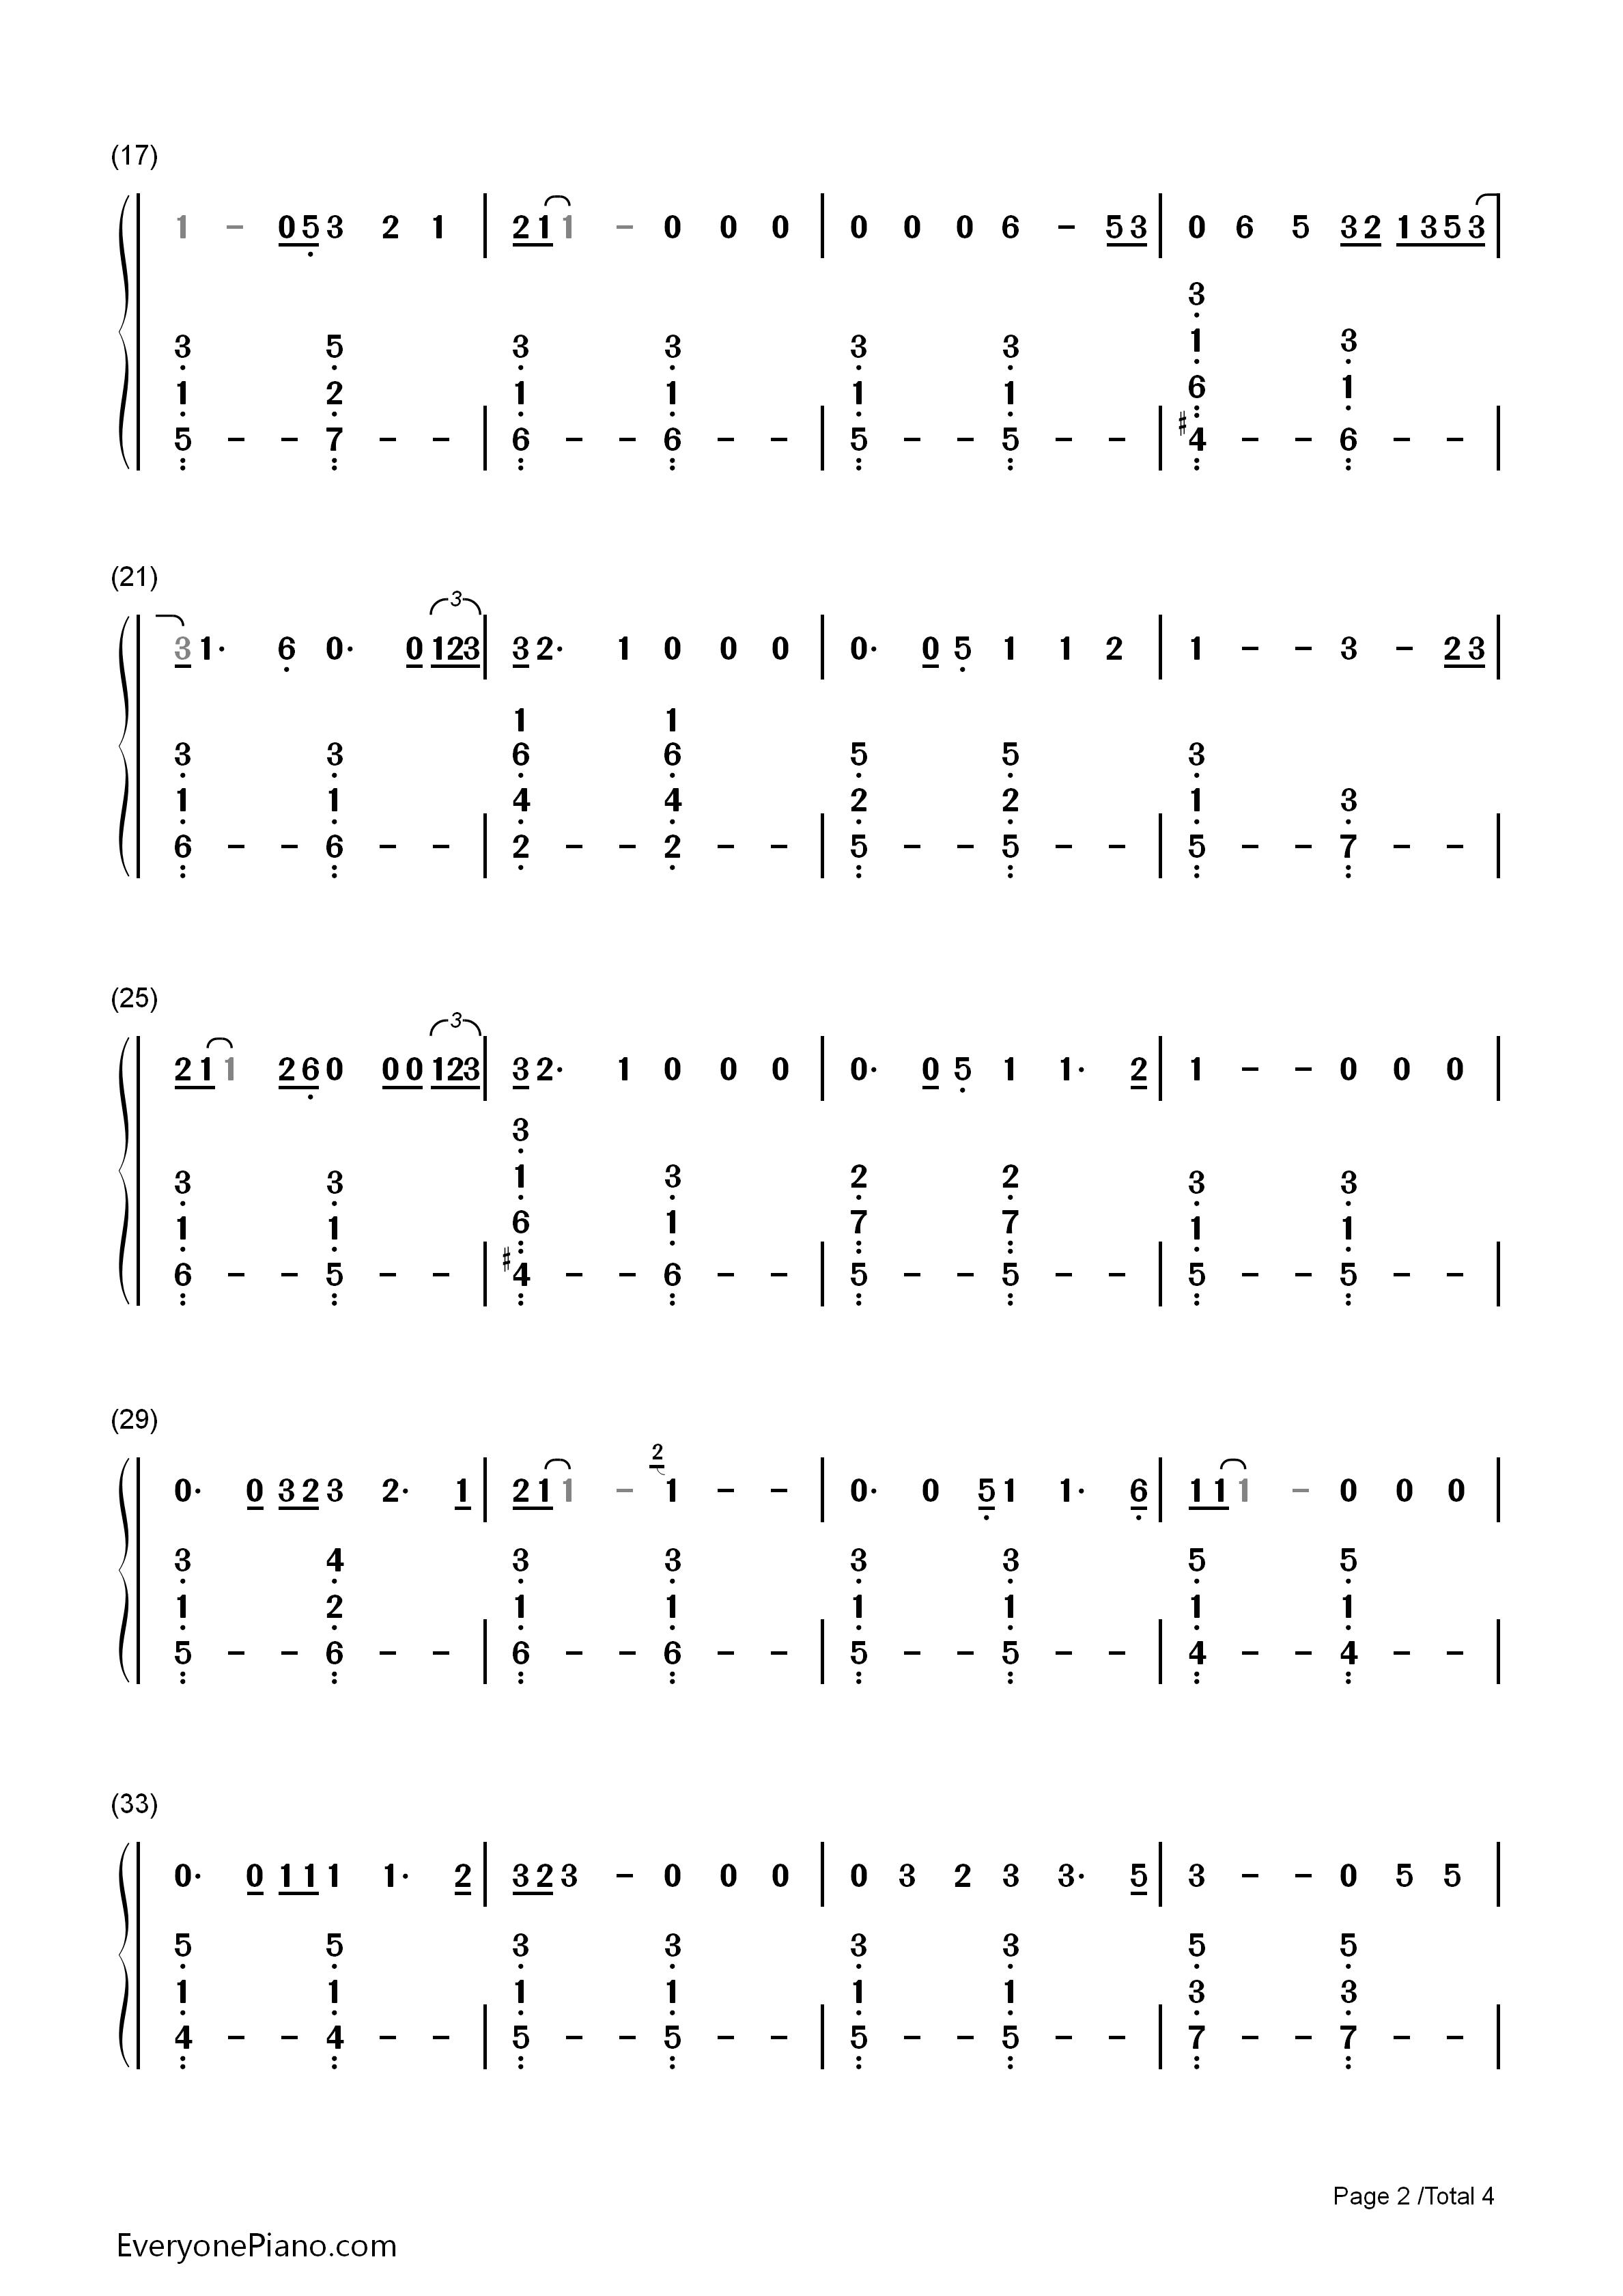 sandcastles beyonce sheet music - Mersn.proforum.co